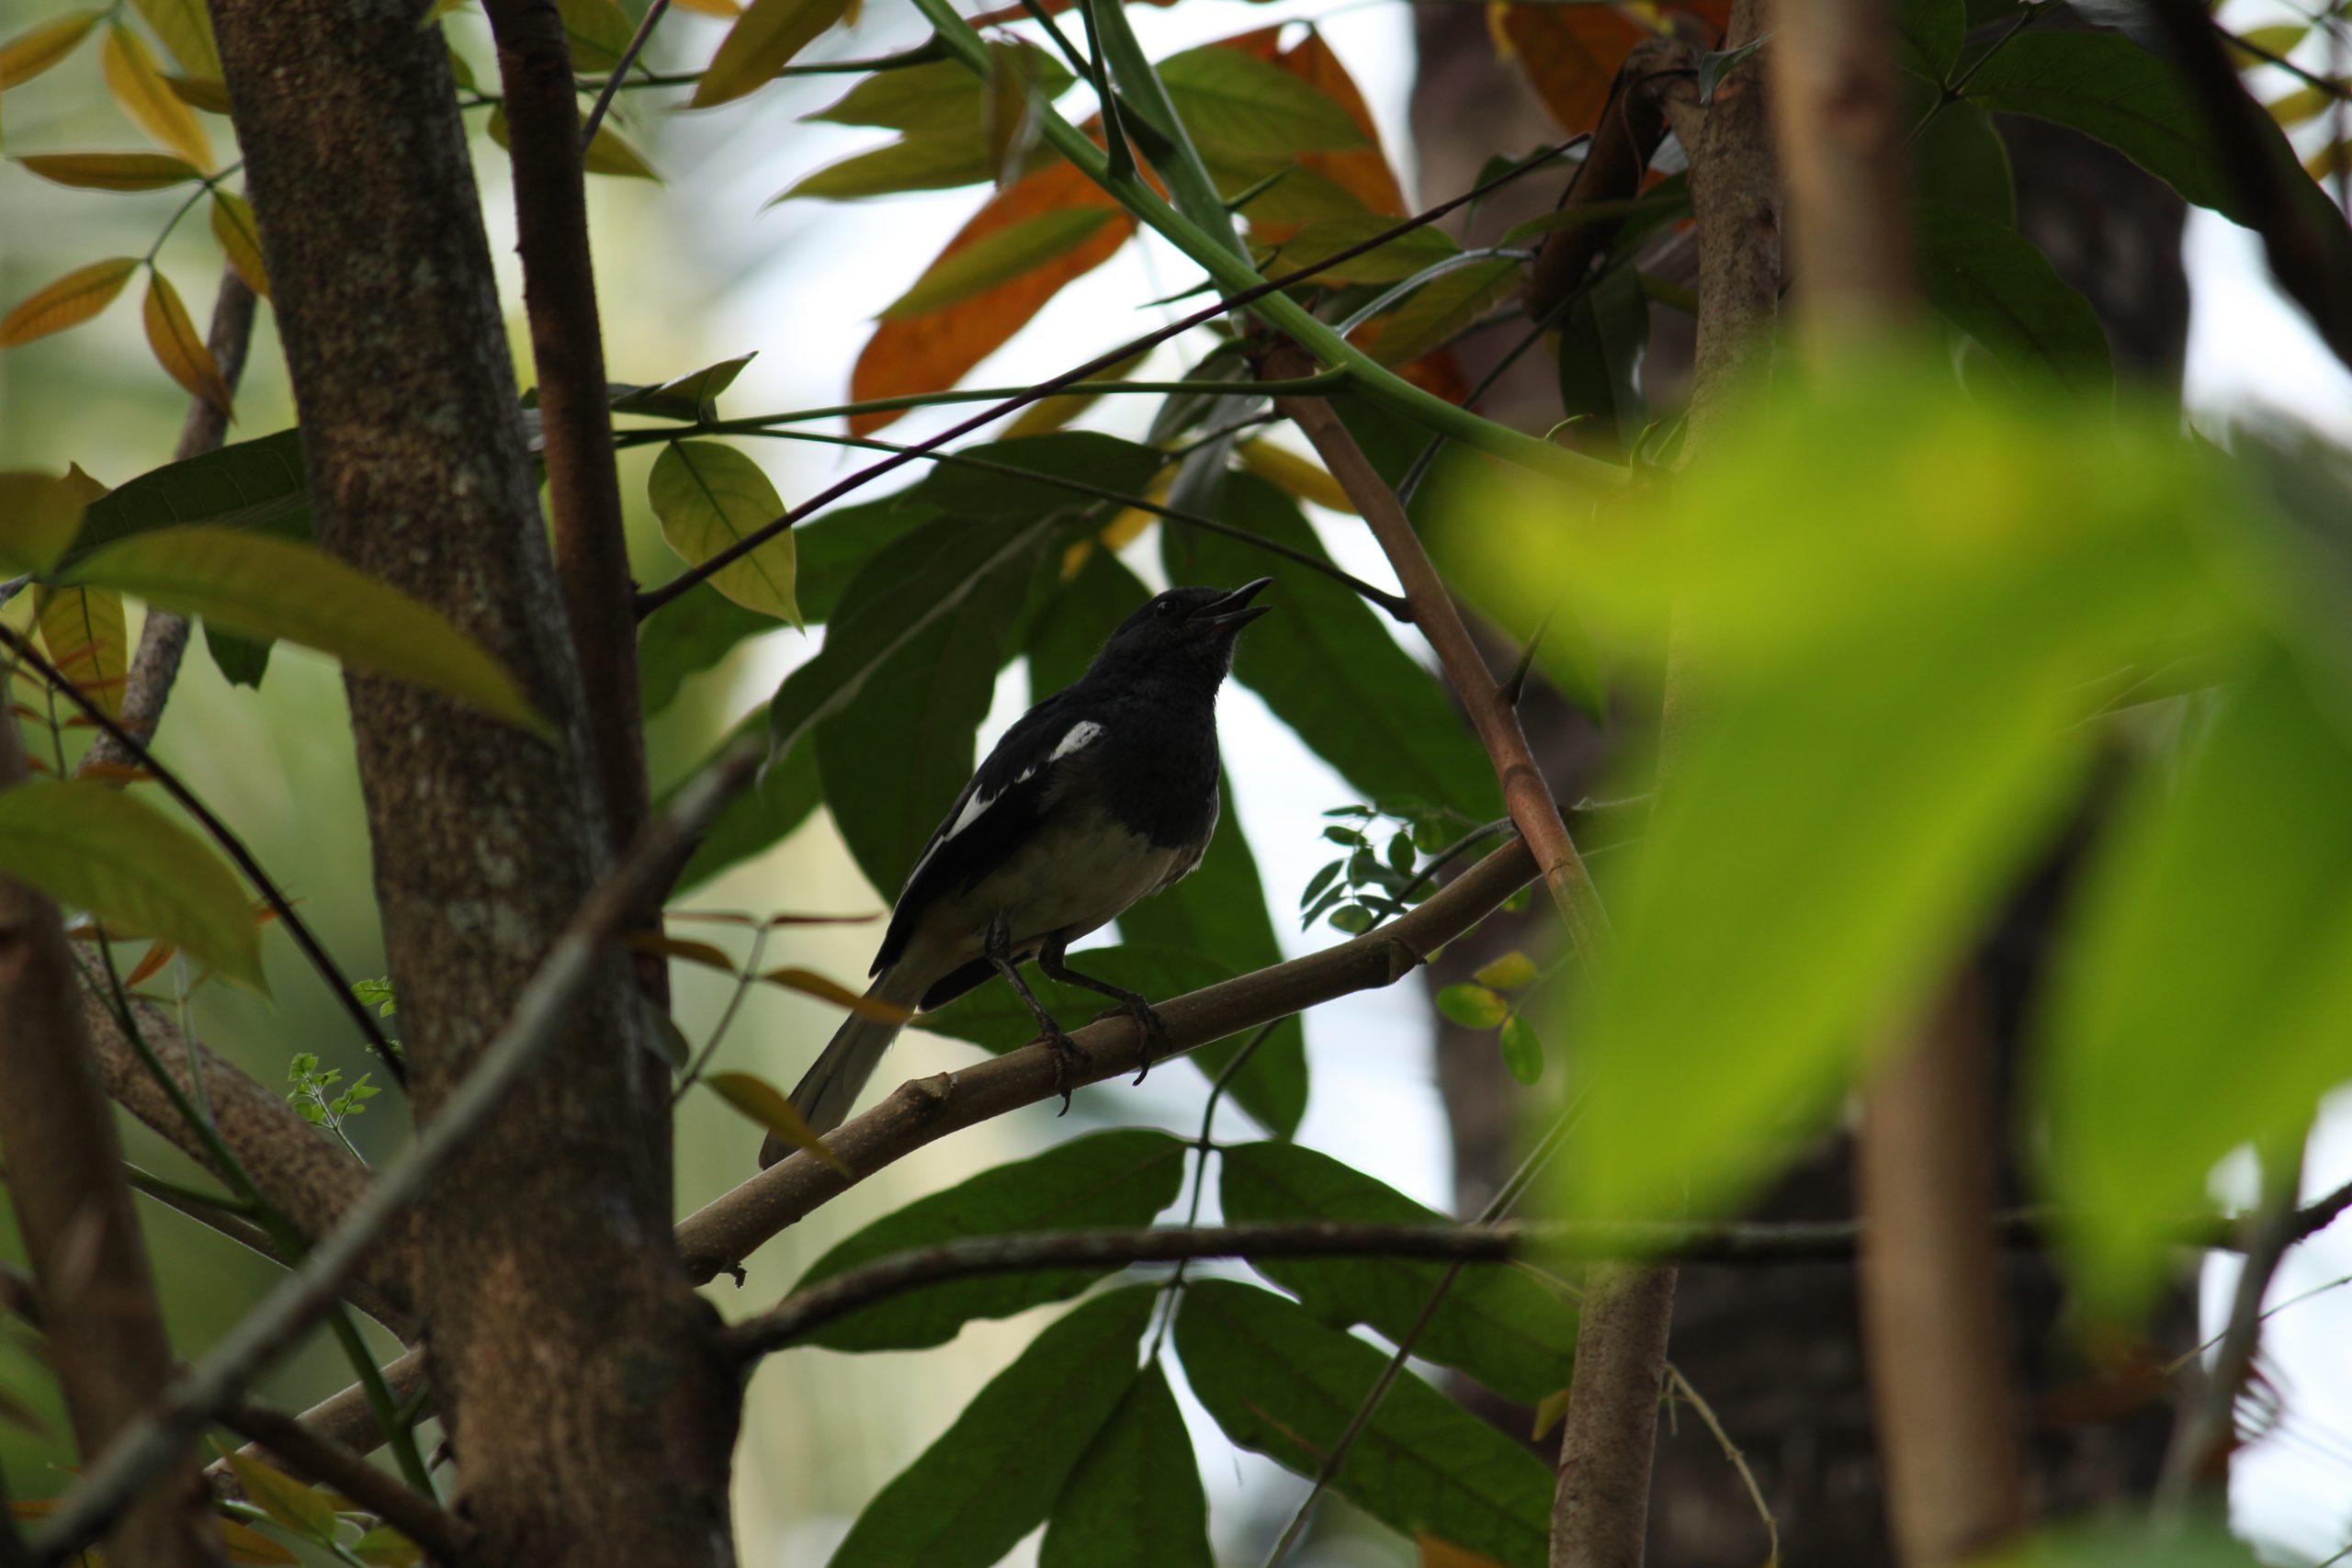 Black bird sitting on a branch